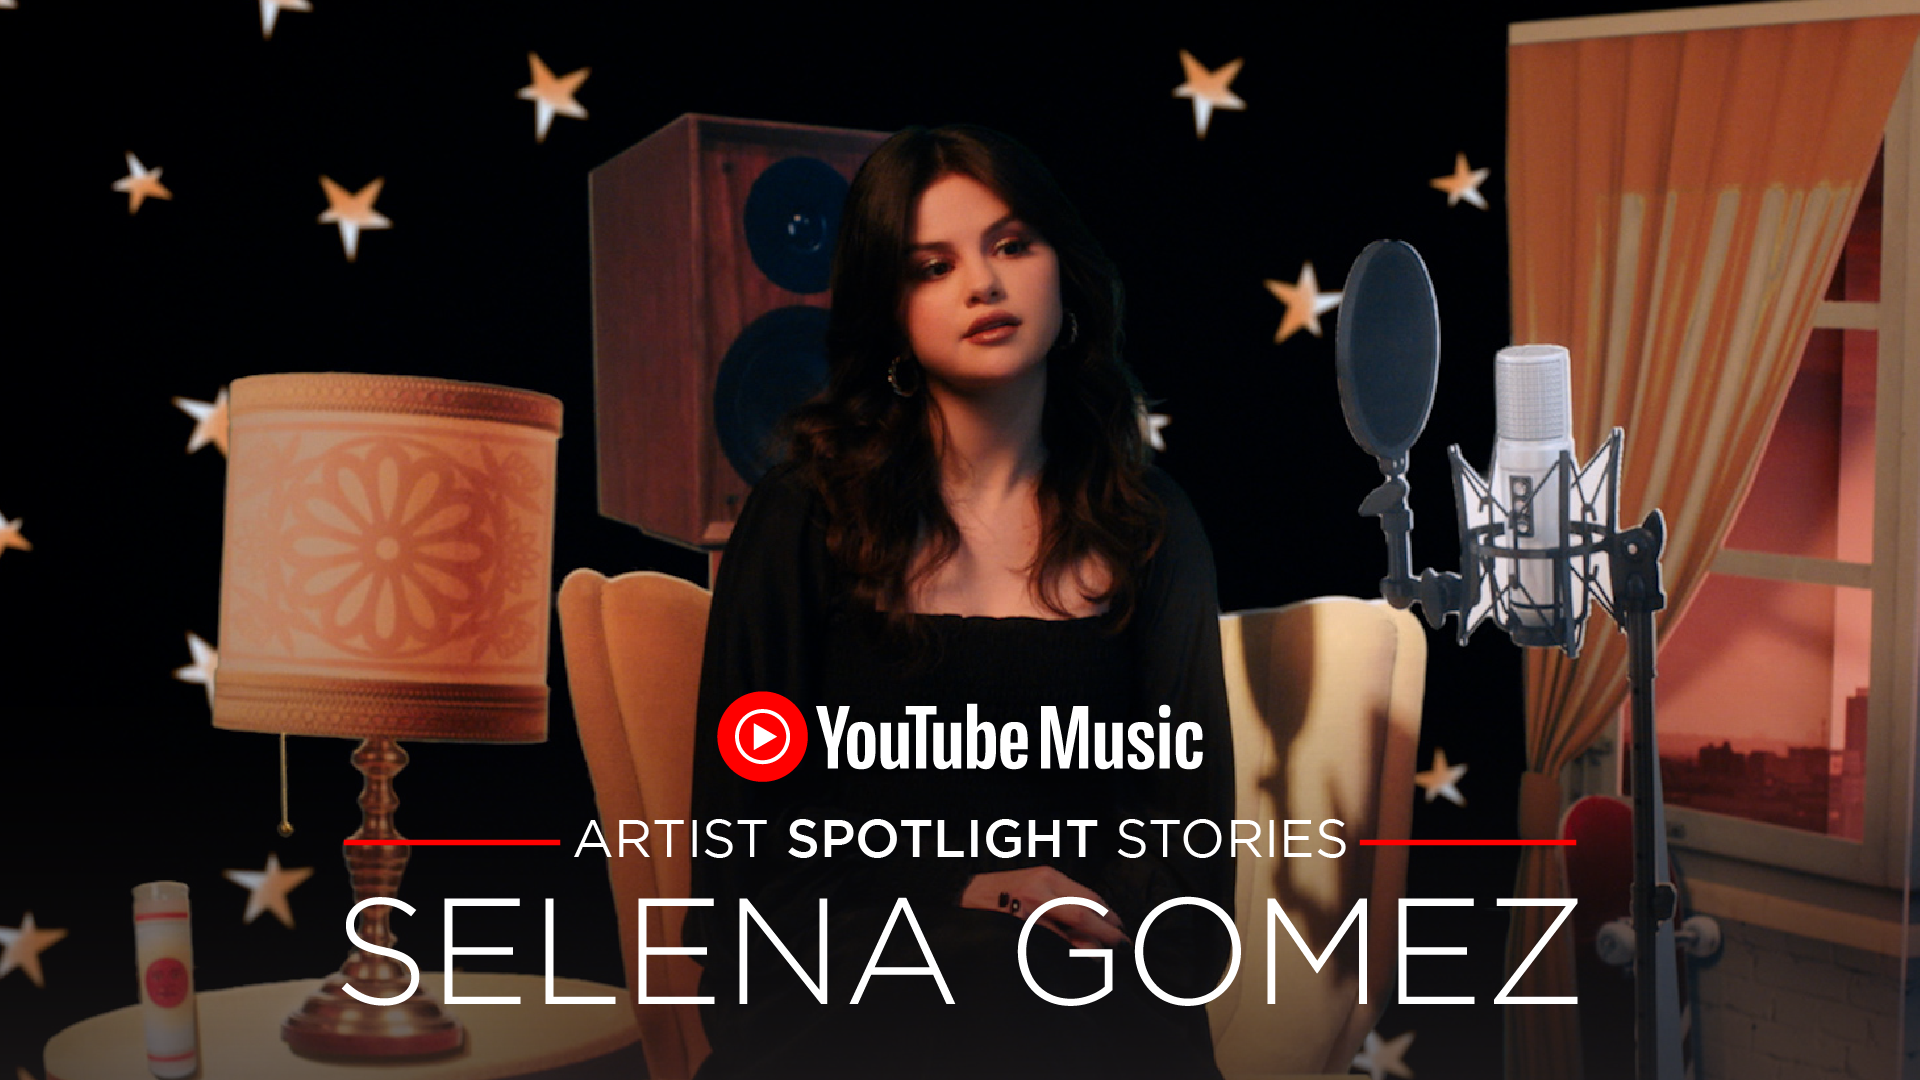 Selena Gomez: Artist Spotlight Stories